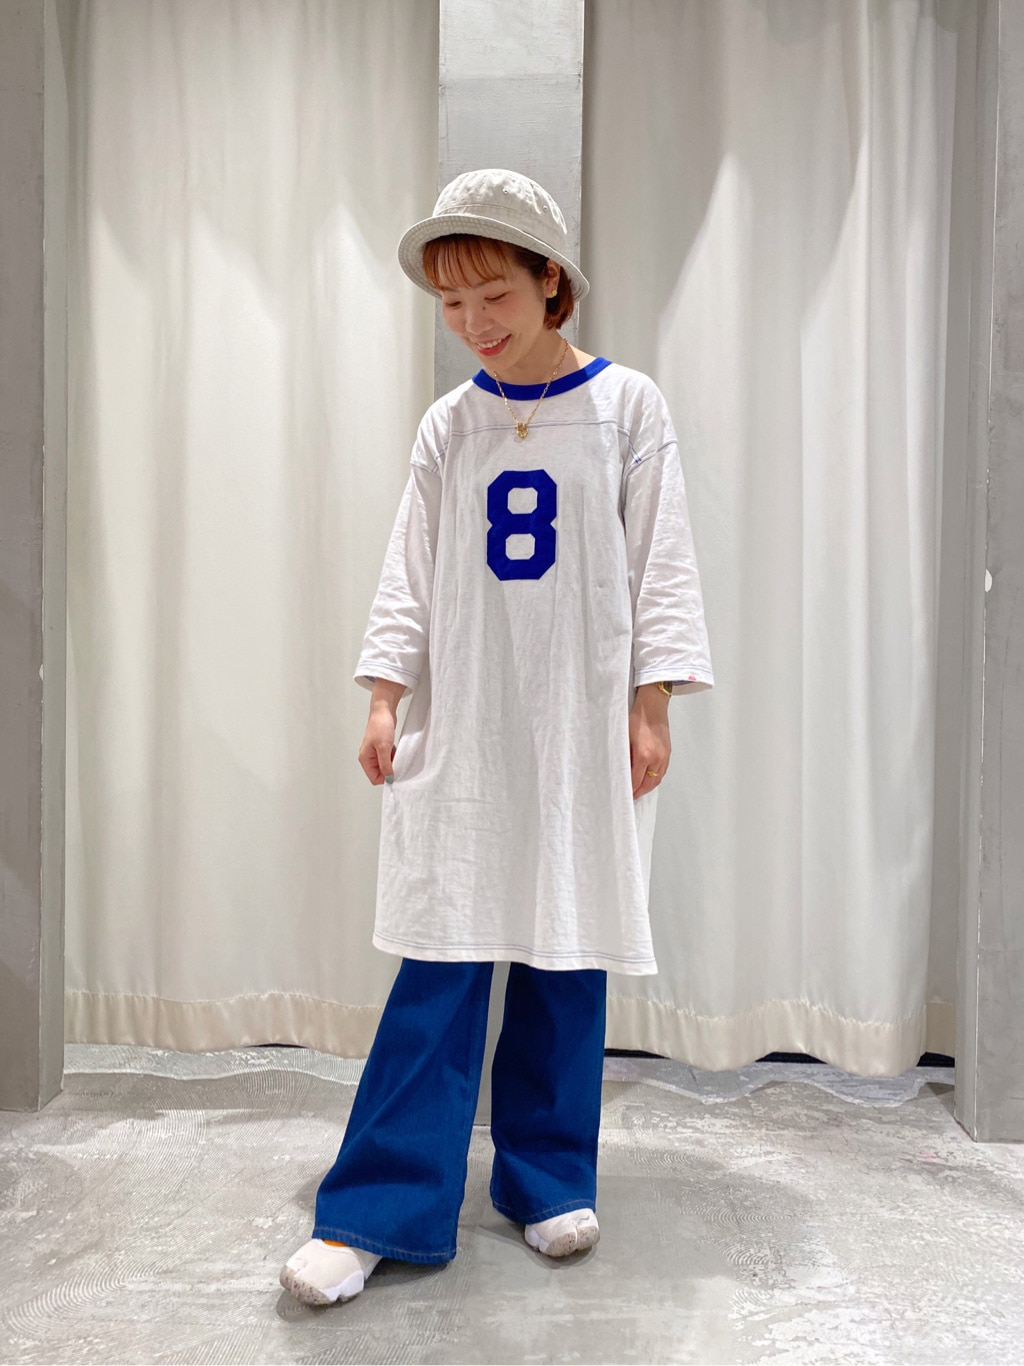 - CHILD WOMAN CHILD WOMAN , PAR ICI ルミネ横浜 身長:153cm 2021.05.20